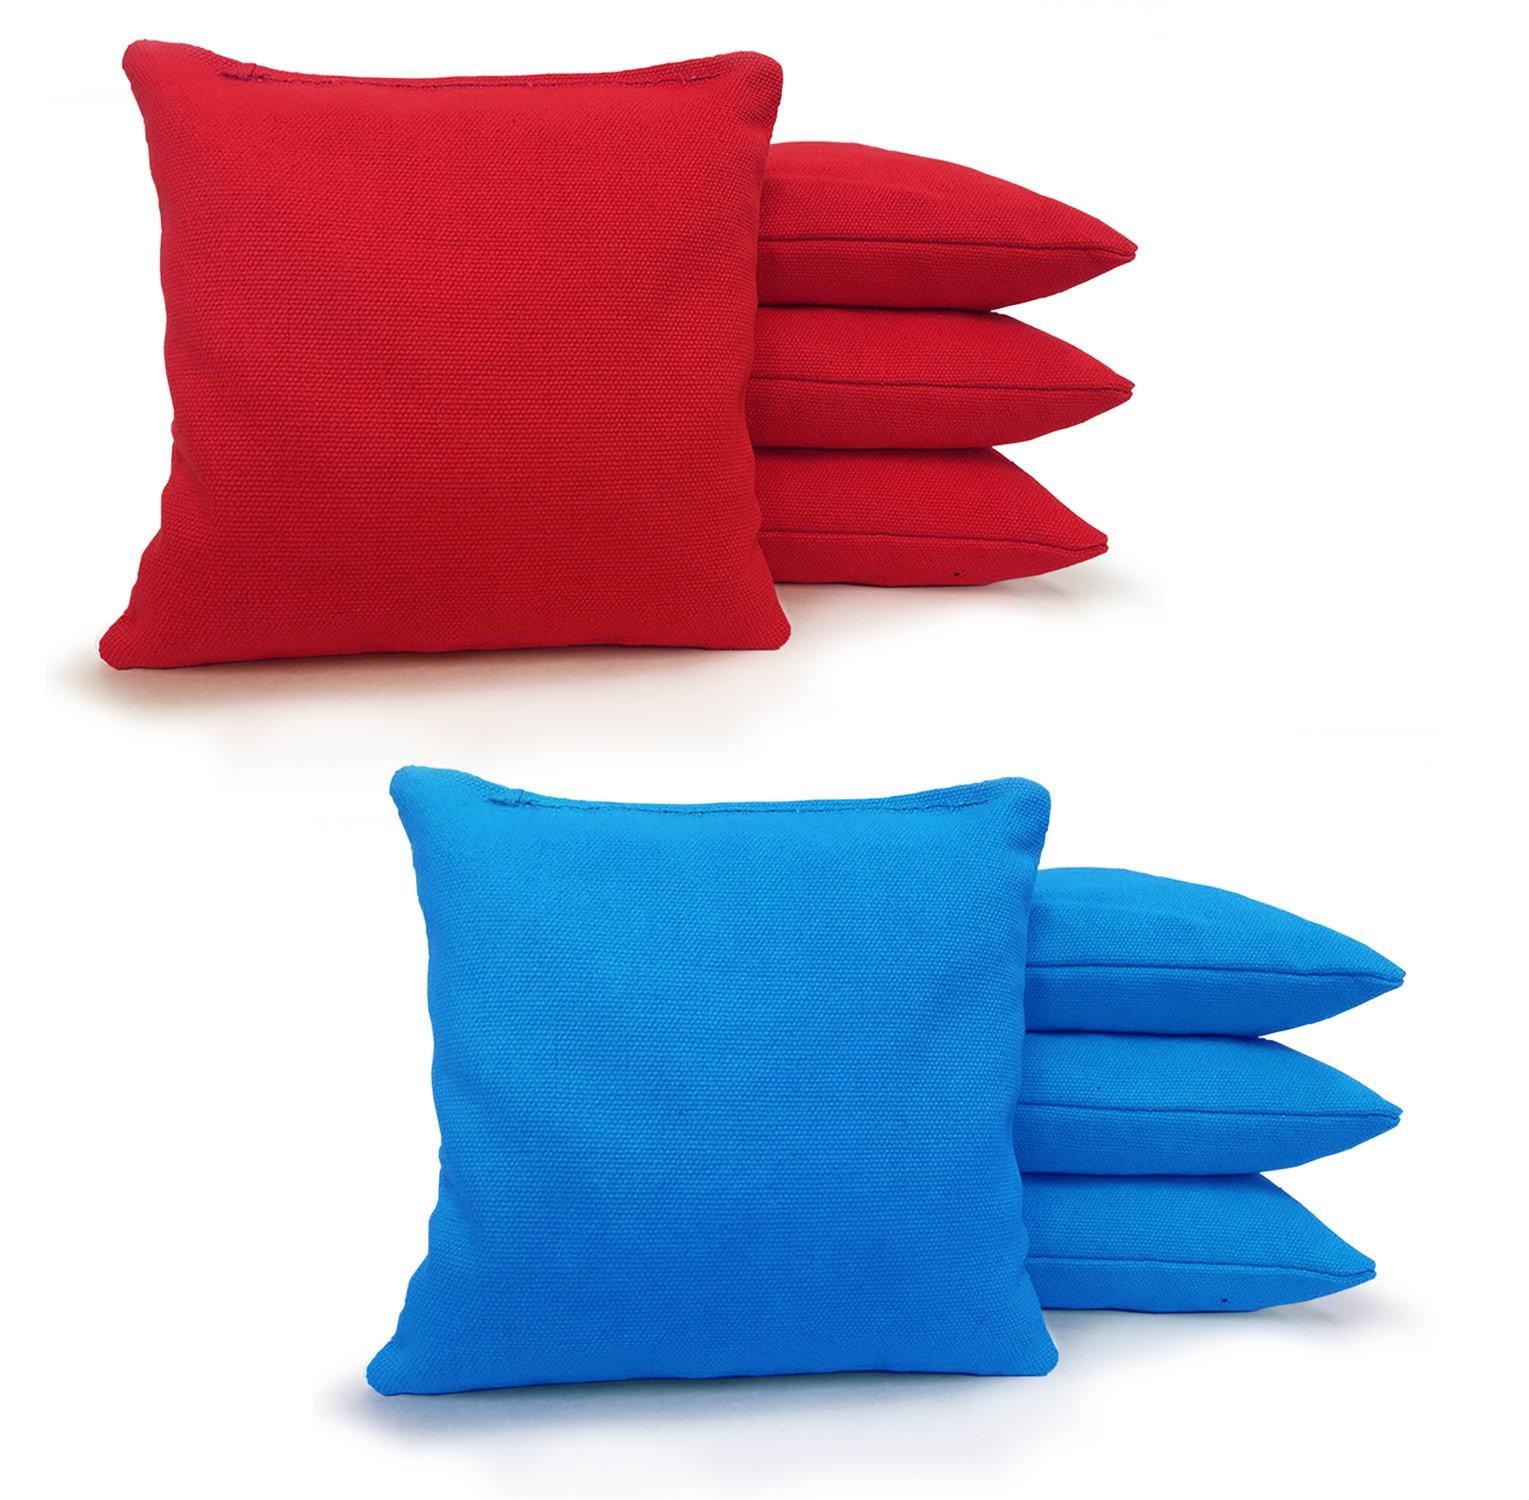 Johnson Enterprises, LLC 8 Standard Corn Filled Regulation Duck Cloth Cornhole Bags 17 Colors Available (You Pick)!! (Red/Turquoise) by Johnson Enterprises, LLC